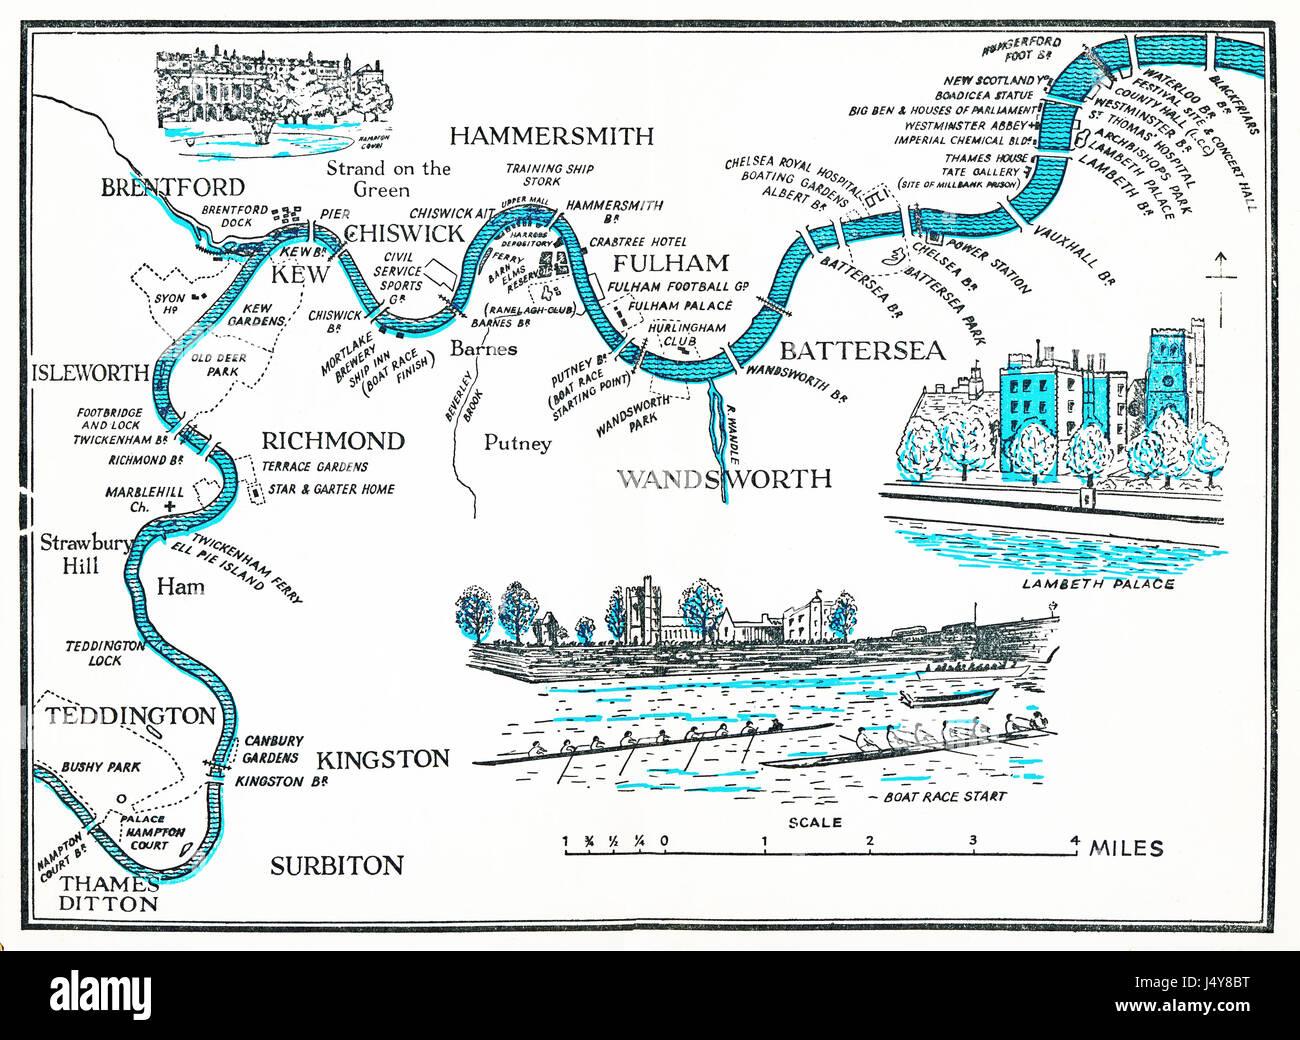 Remo Mapa del Támesis, 1955 plan ilustrado del río Támesis, que serpentea a través de Londres, Imagen De Stock